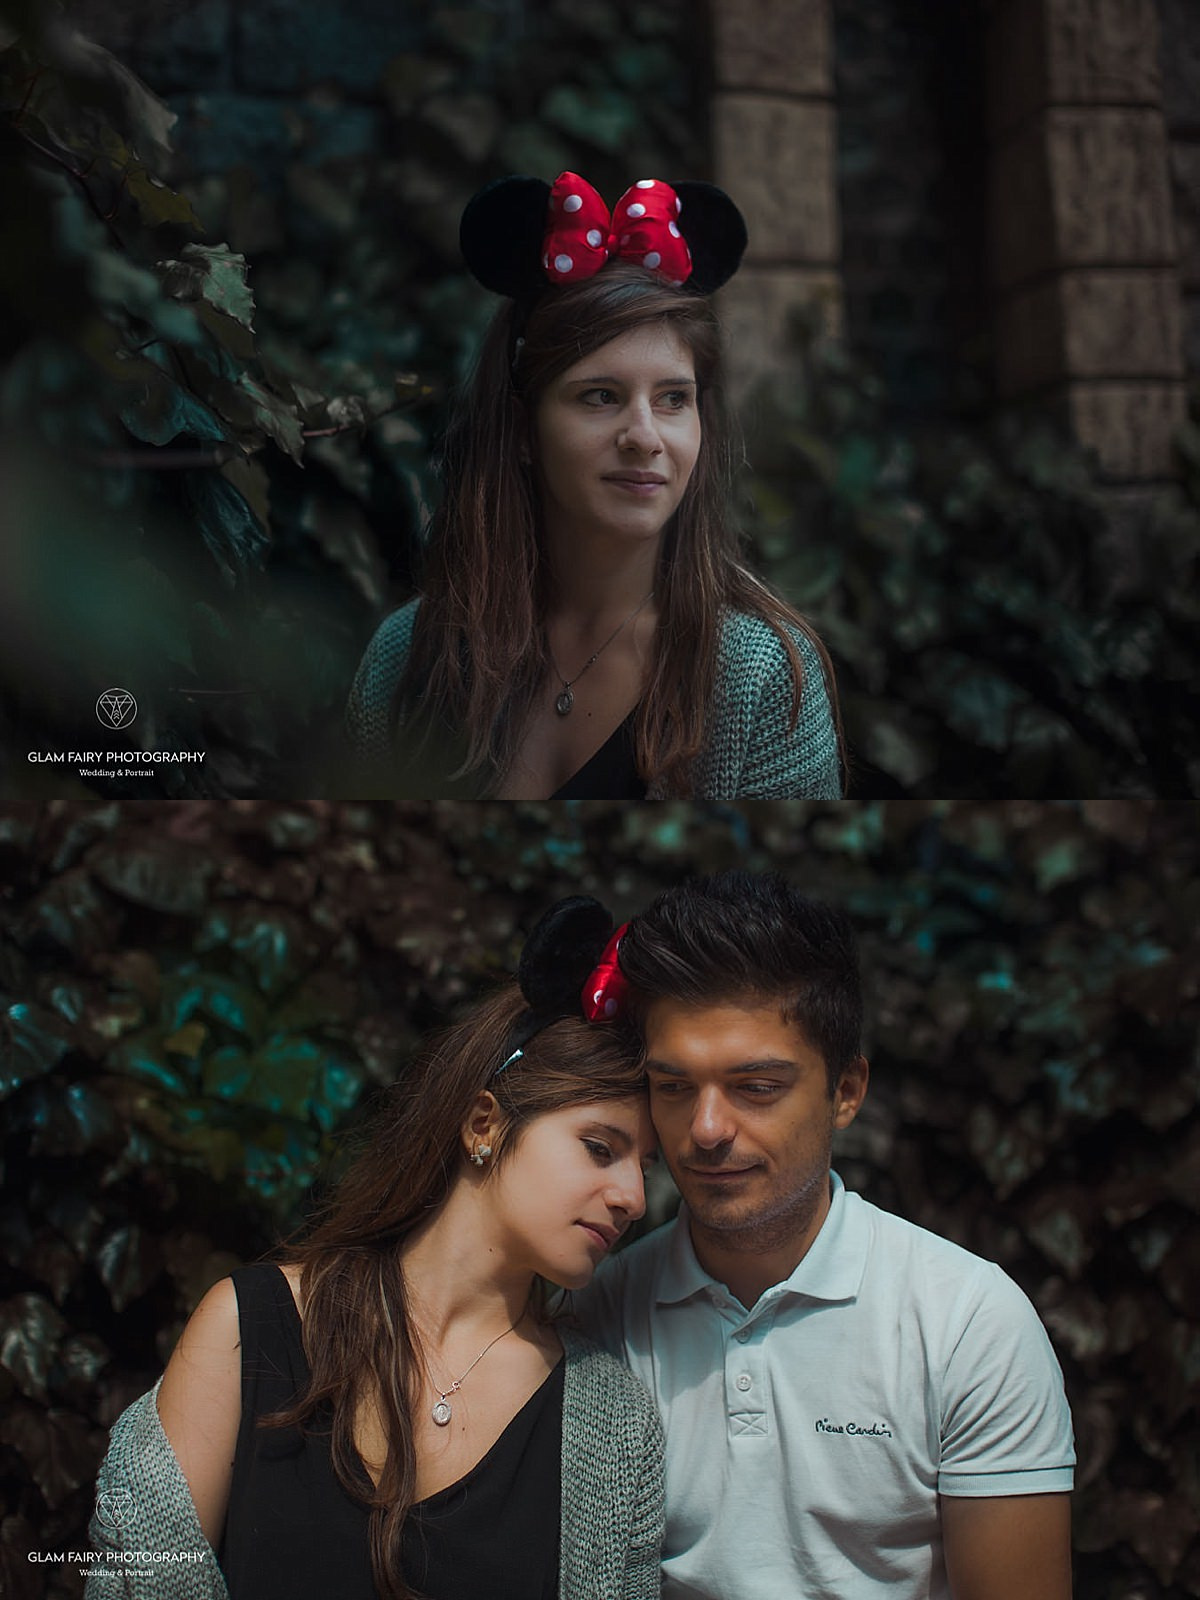 GlamFairyPhotography-seance-couple-et-famille-a-disneyland-paris-roberta_0009